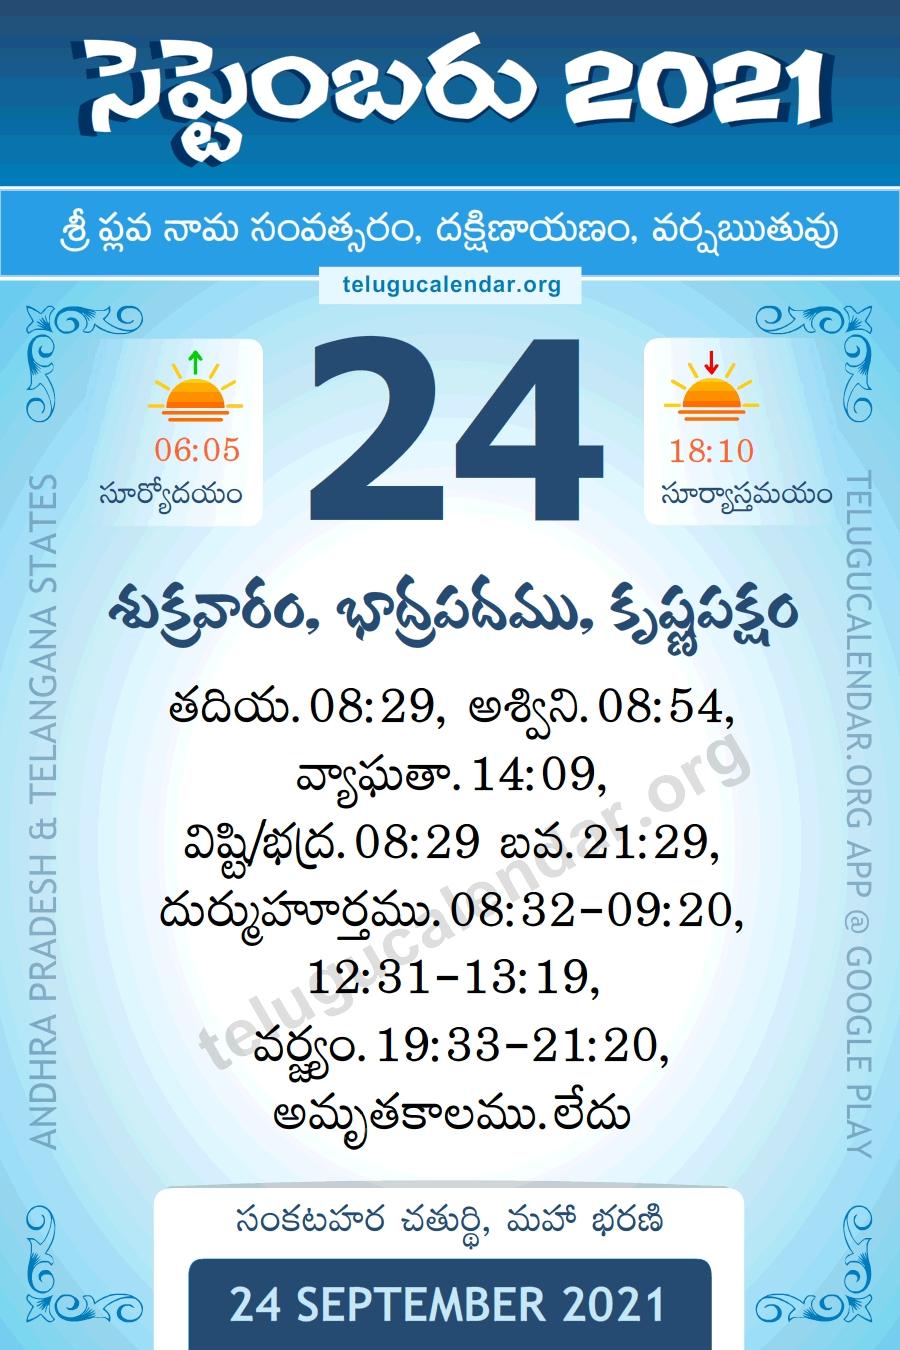 24 September 2021 Panchangam Calendar Daily In Telugu with regard to Telugu Calendar 2021 Panchangam Graphics